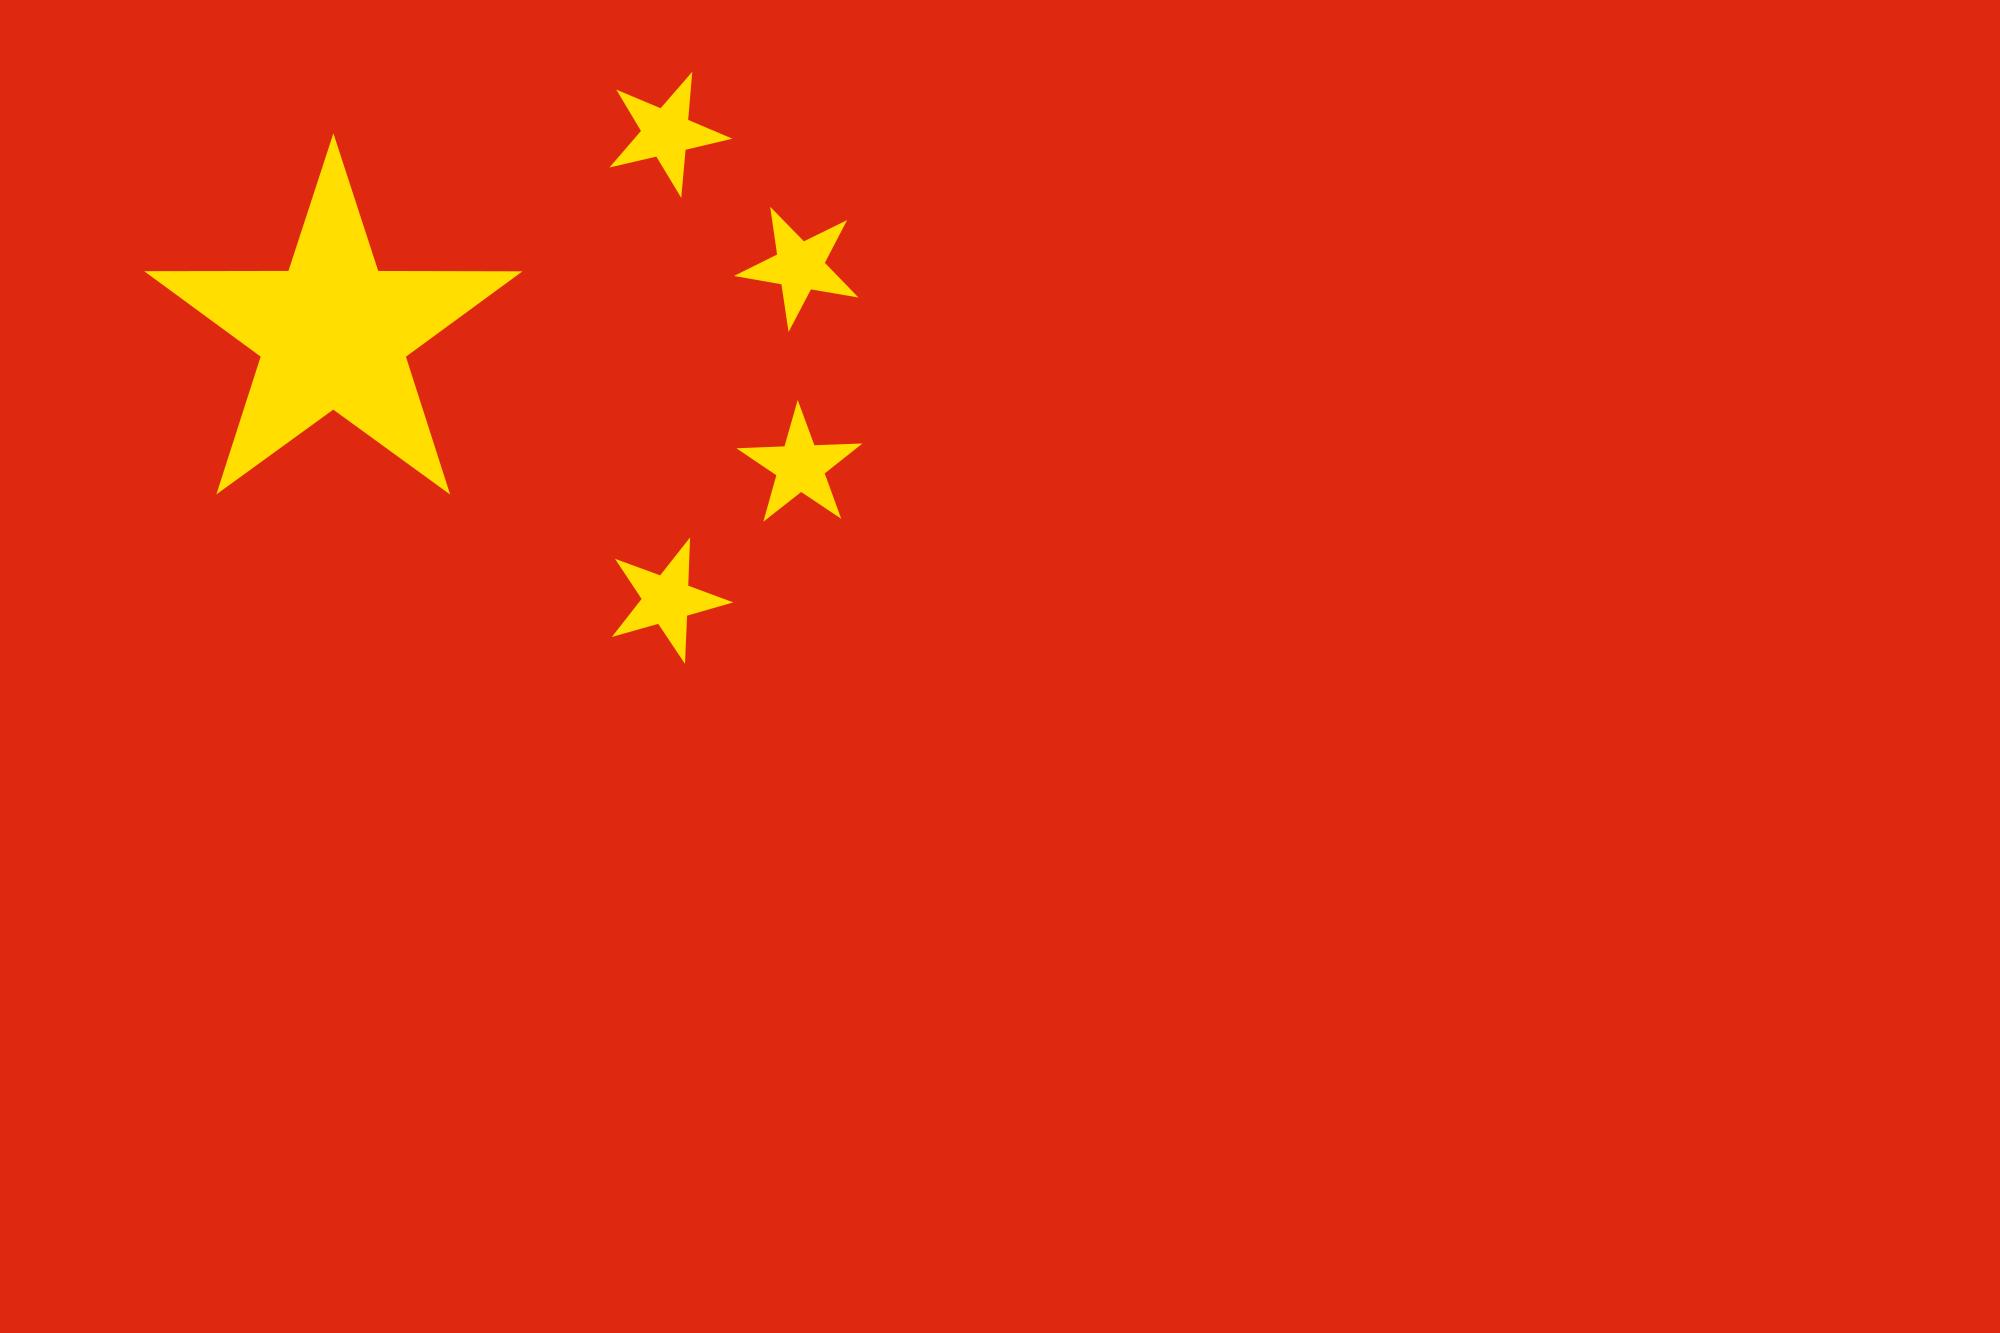 Flag of China.png